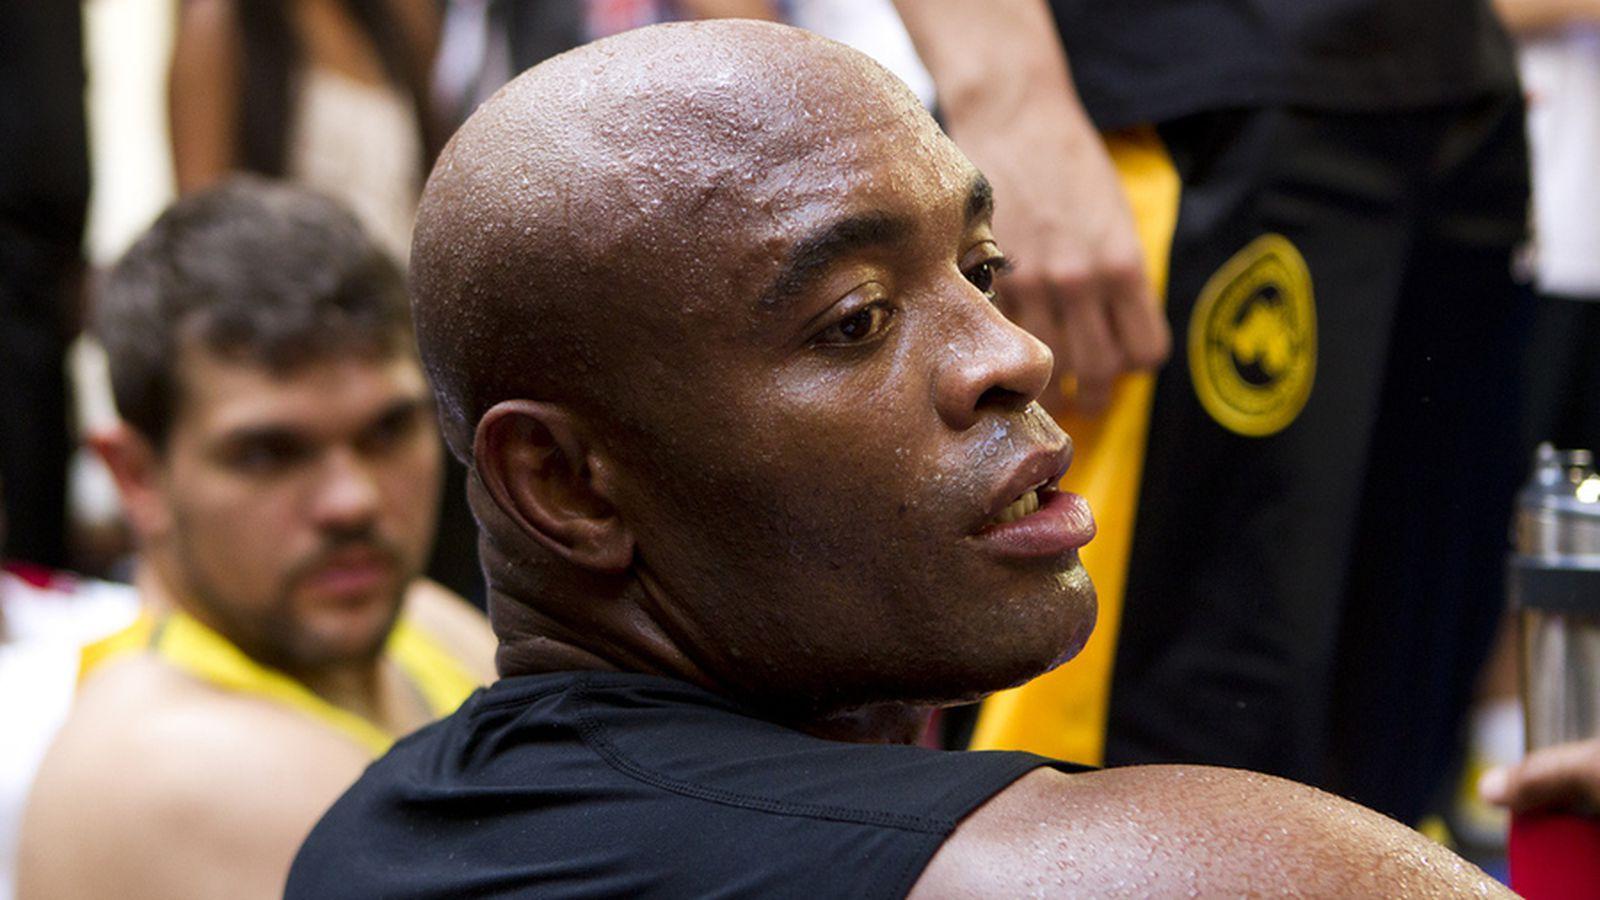 Anderson Silva won't fight in 2014